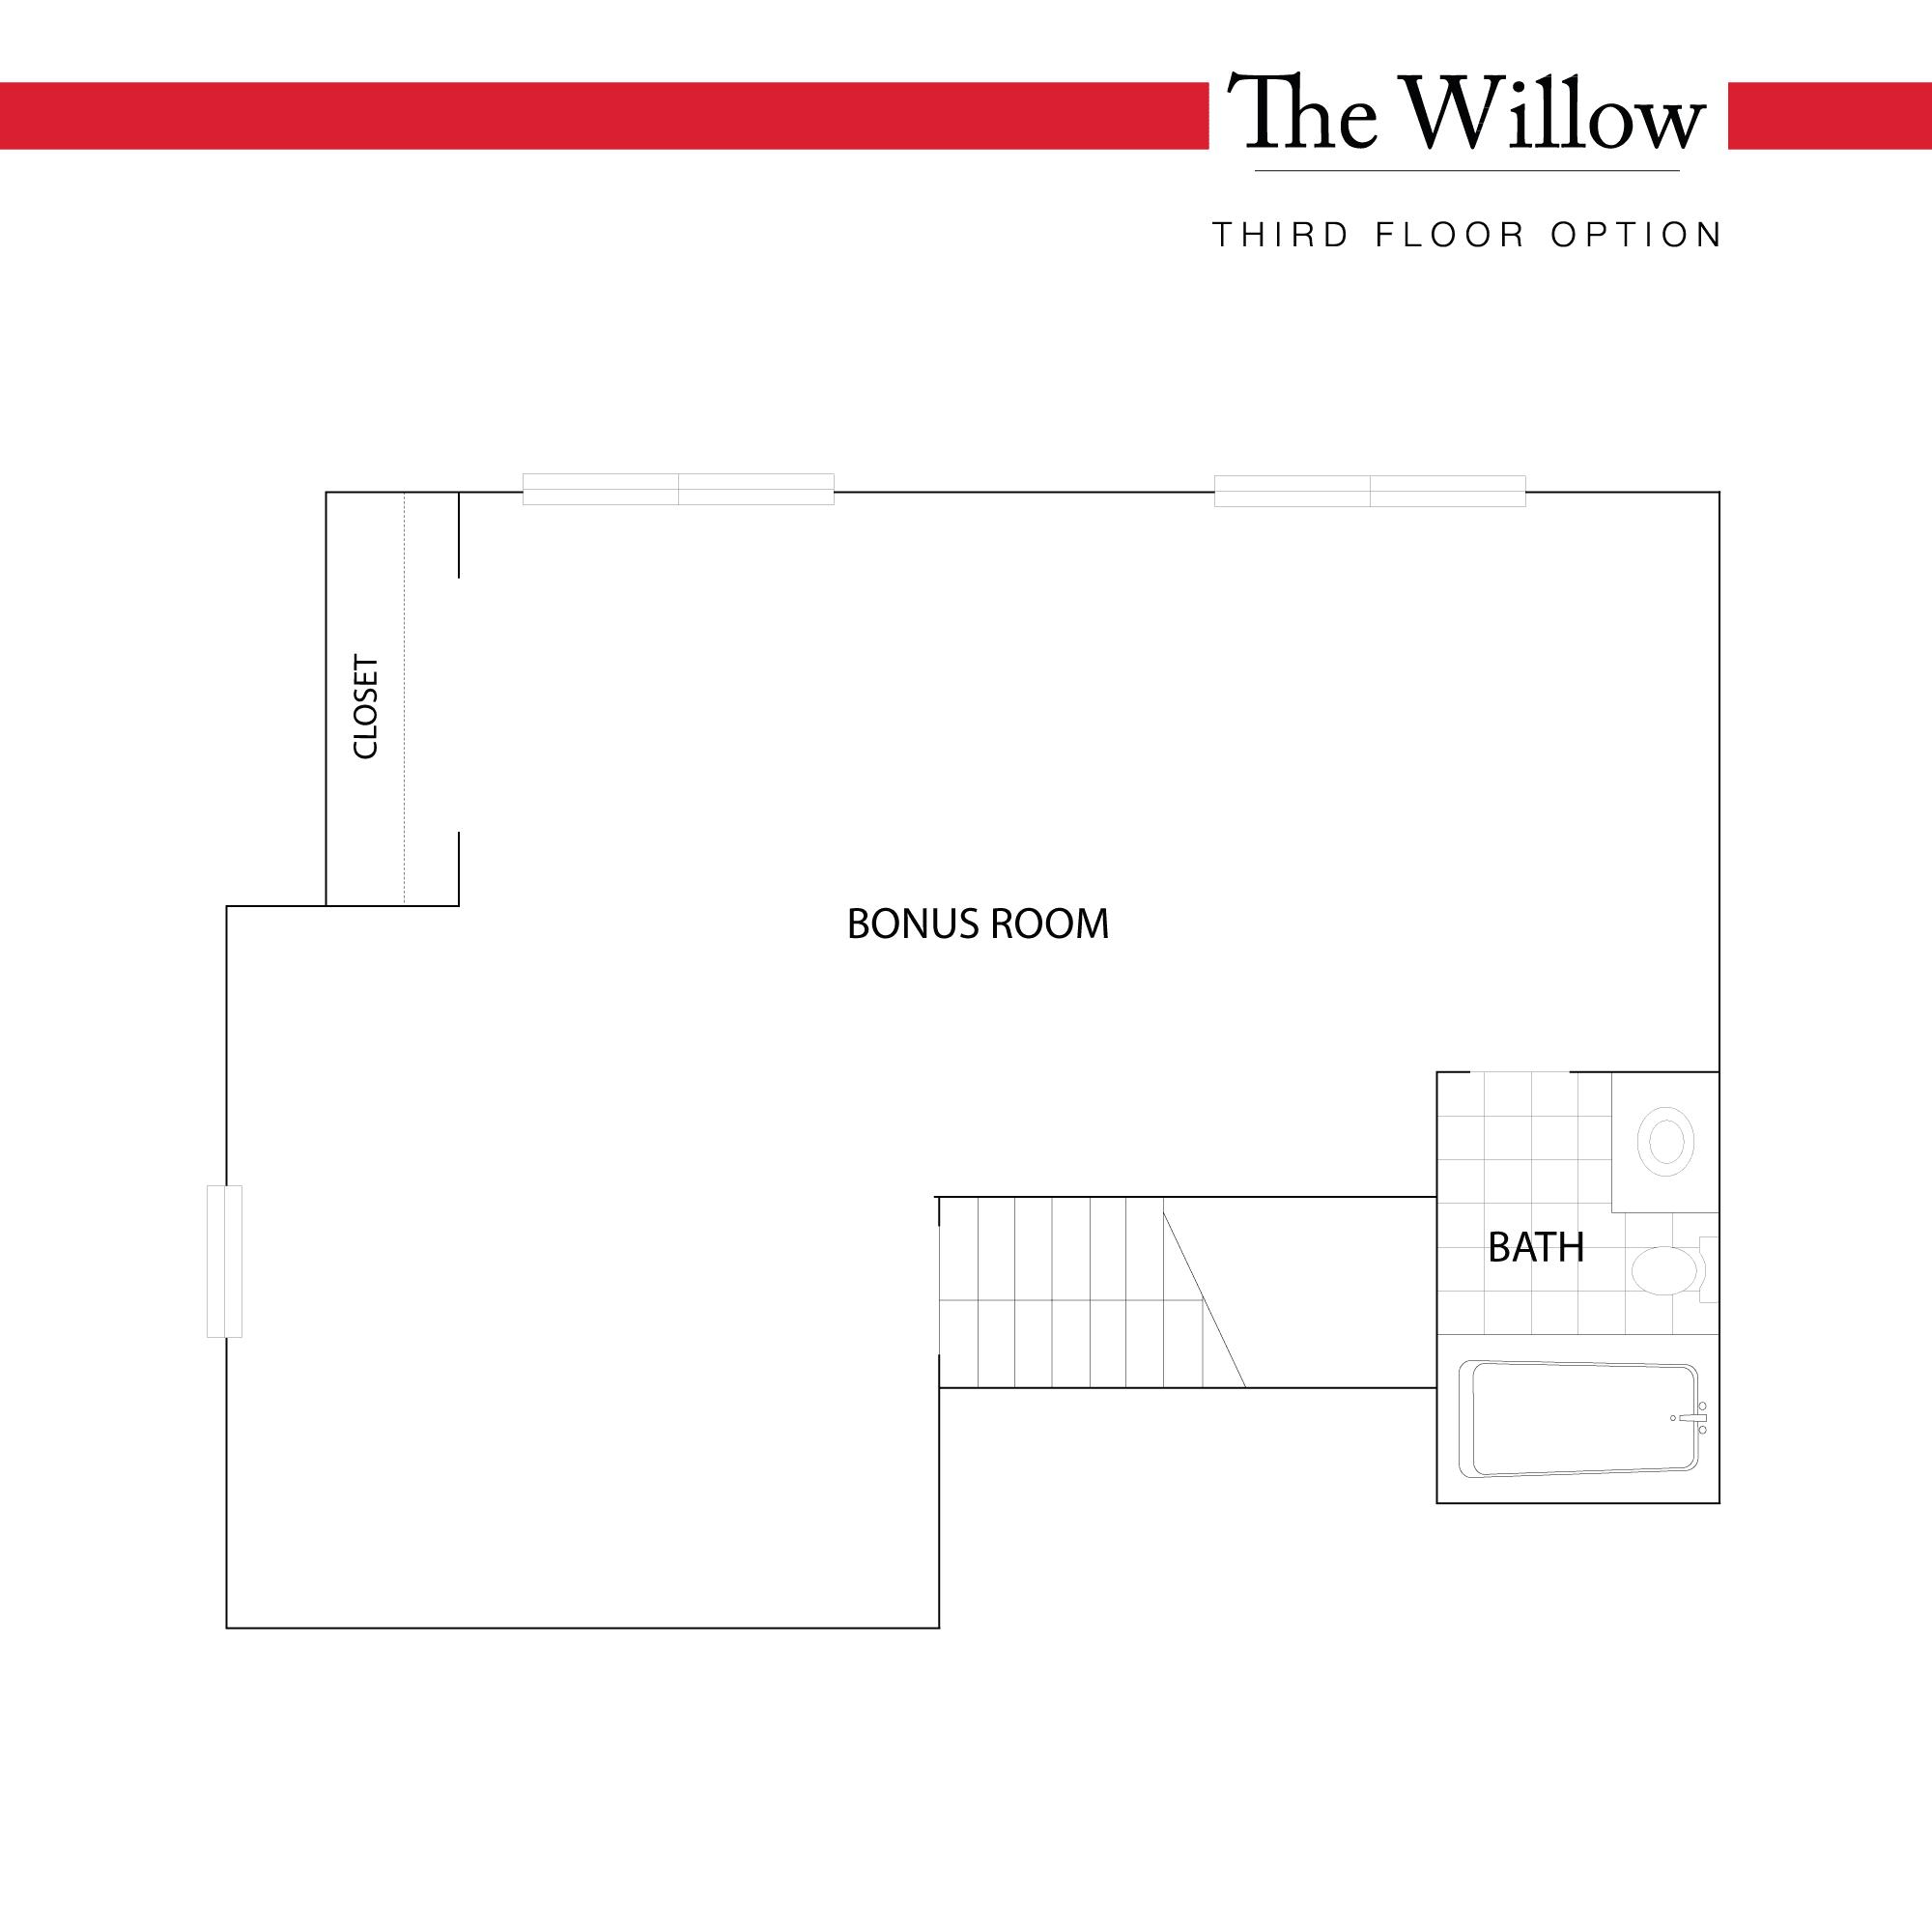 Third Floor Option